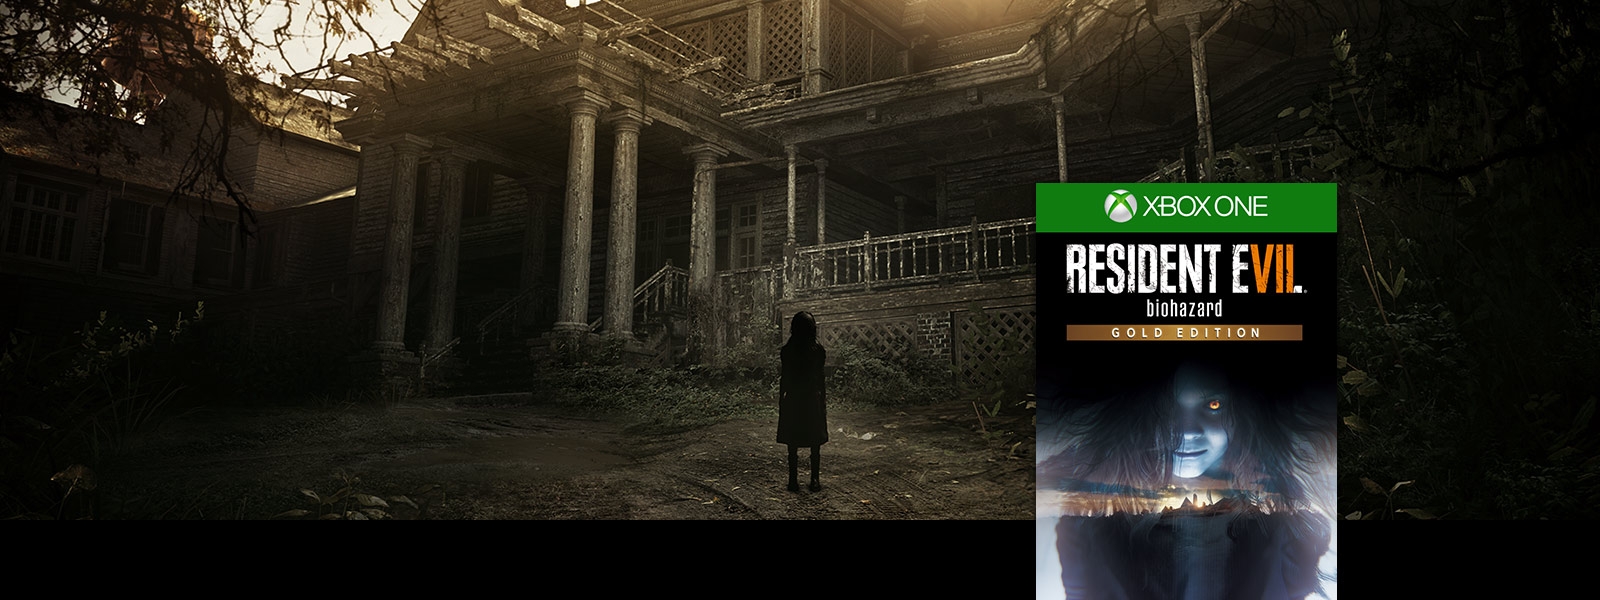 Resident Evil 7 biohazard gold edition box